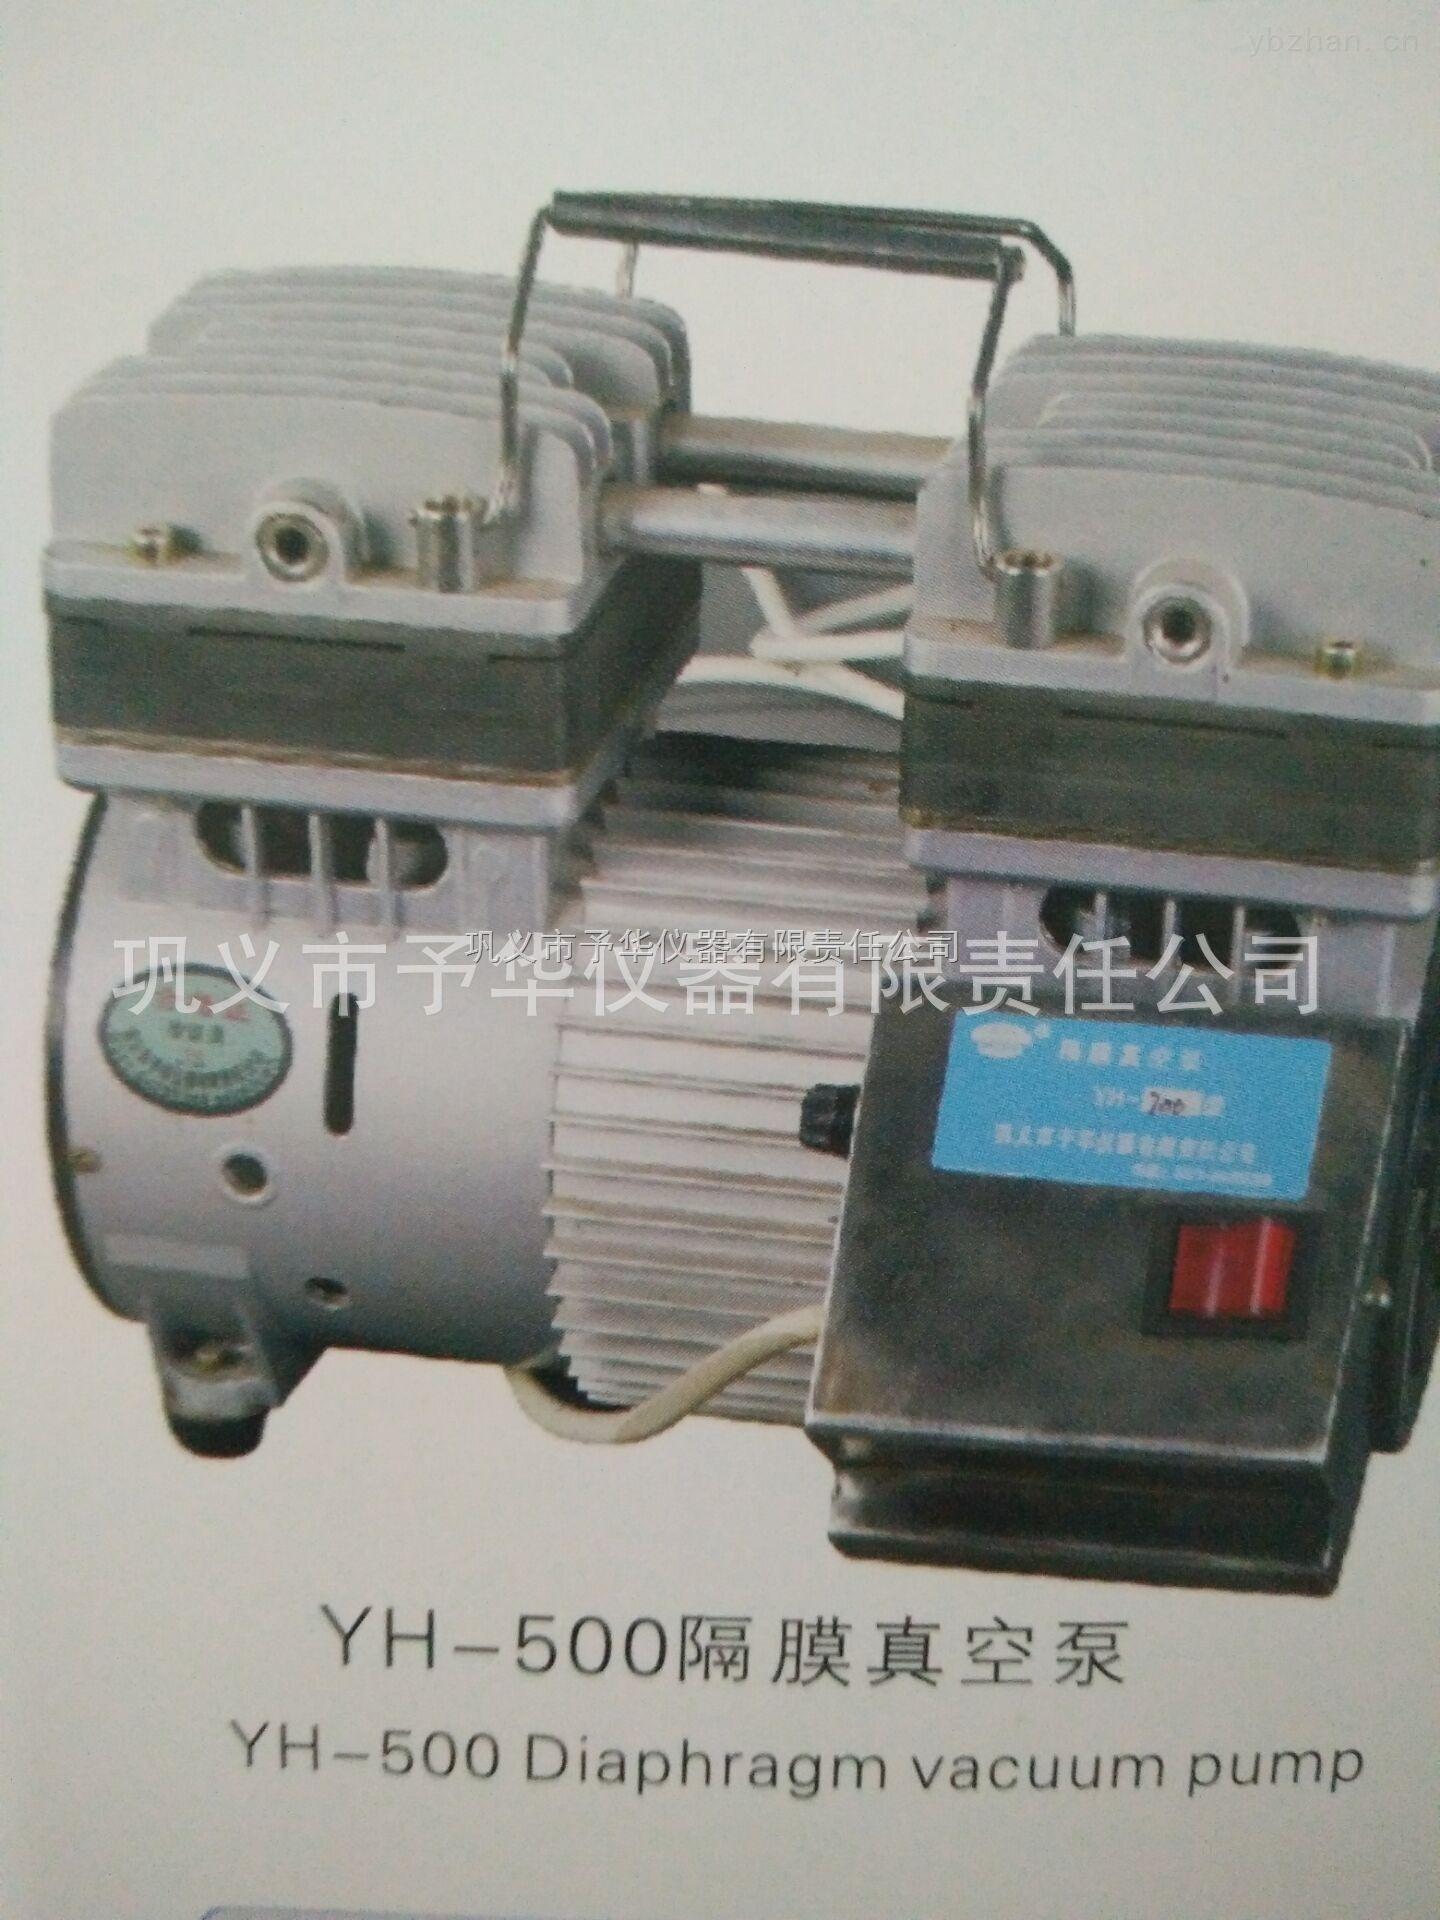 YH-700-微型实验室用防腐隔膜式真空泵生产厂家